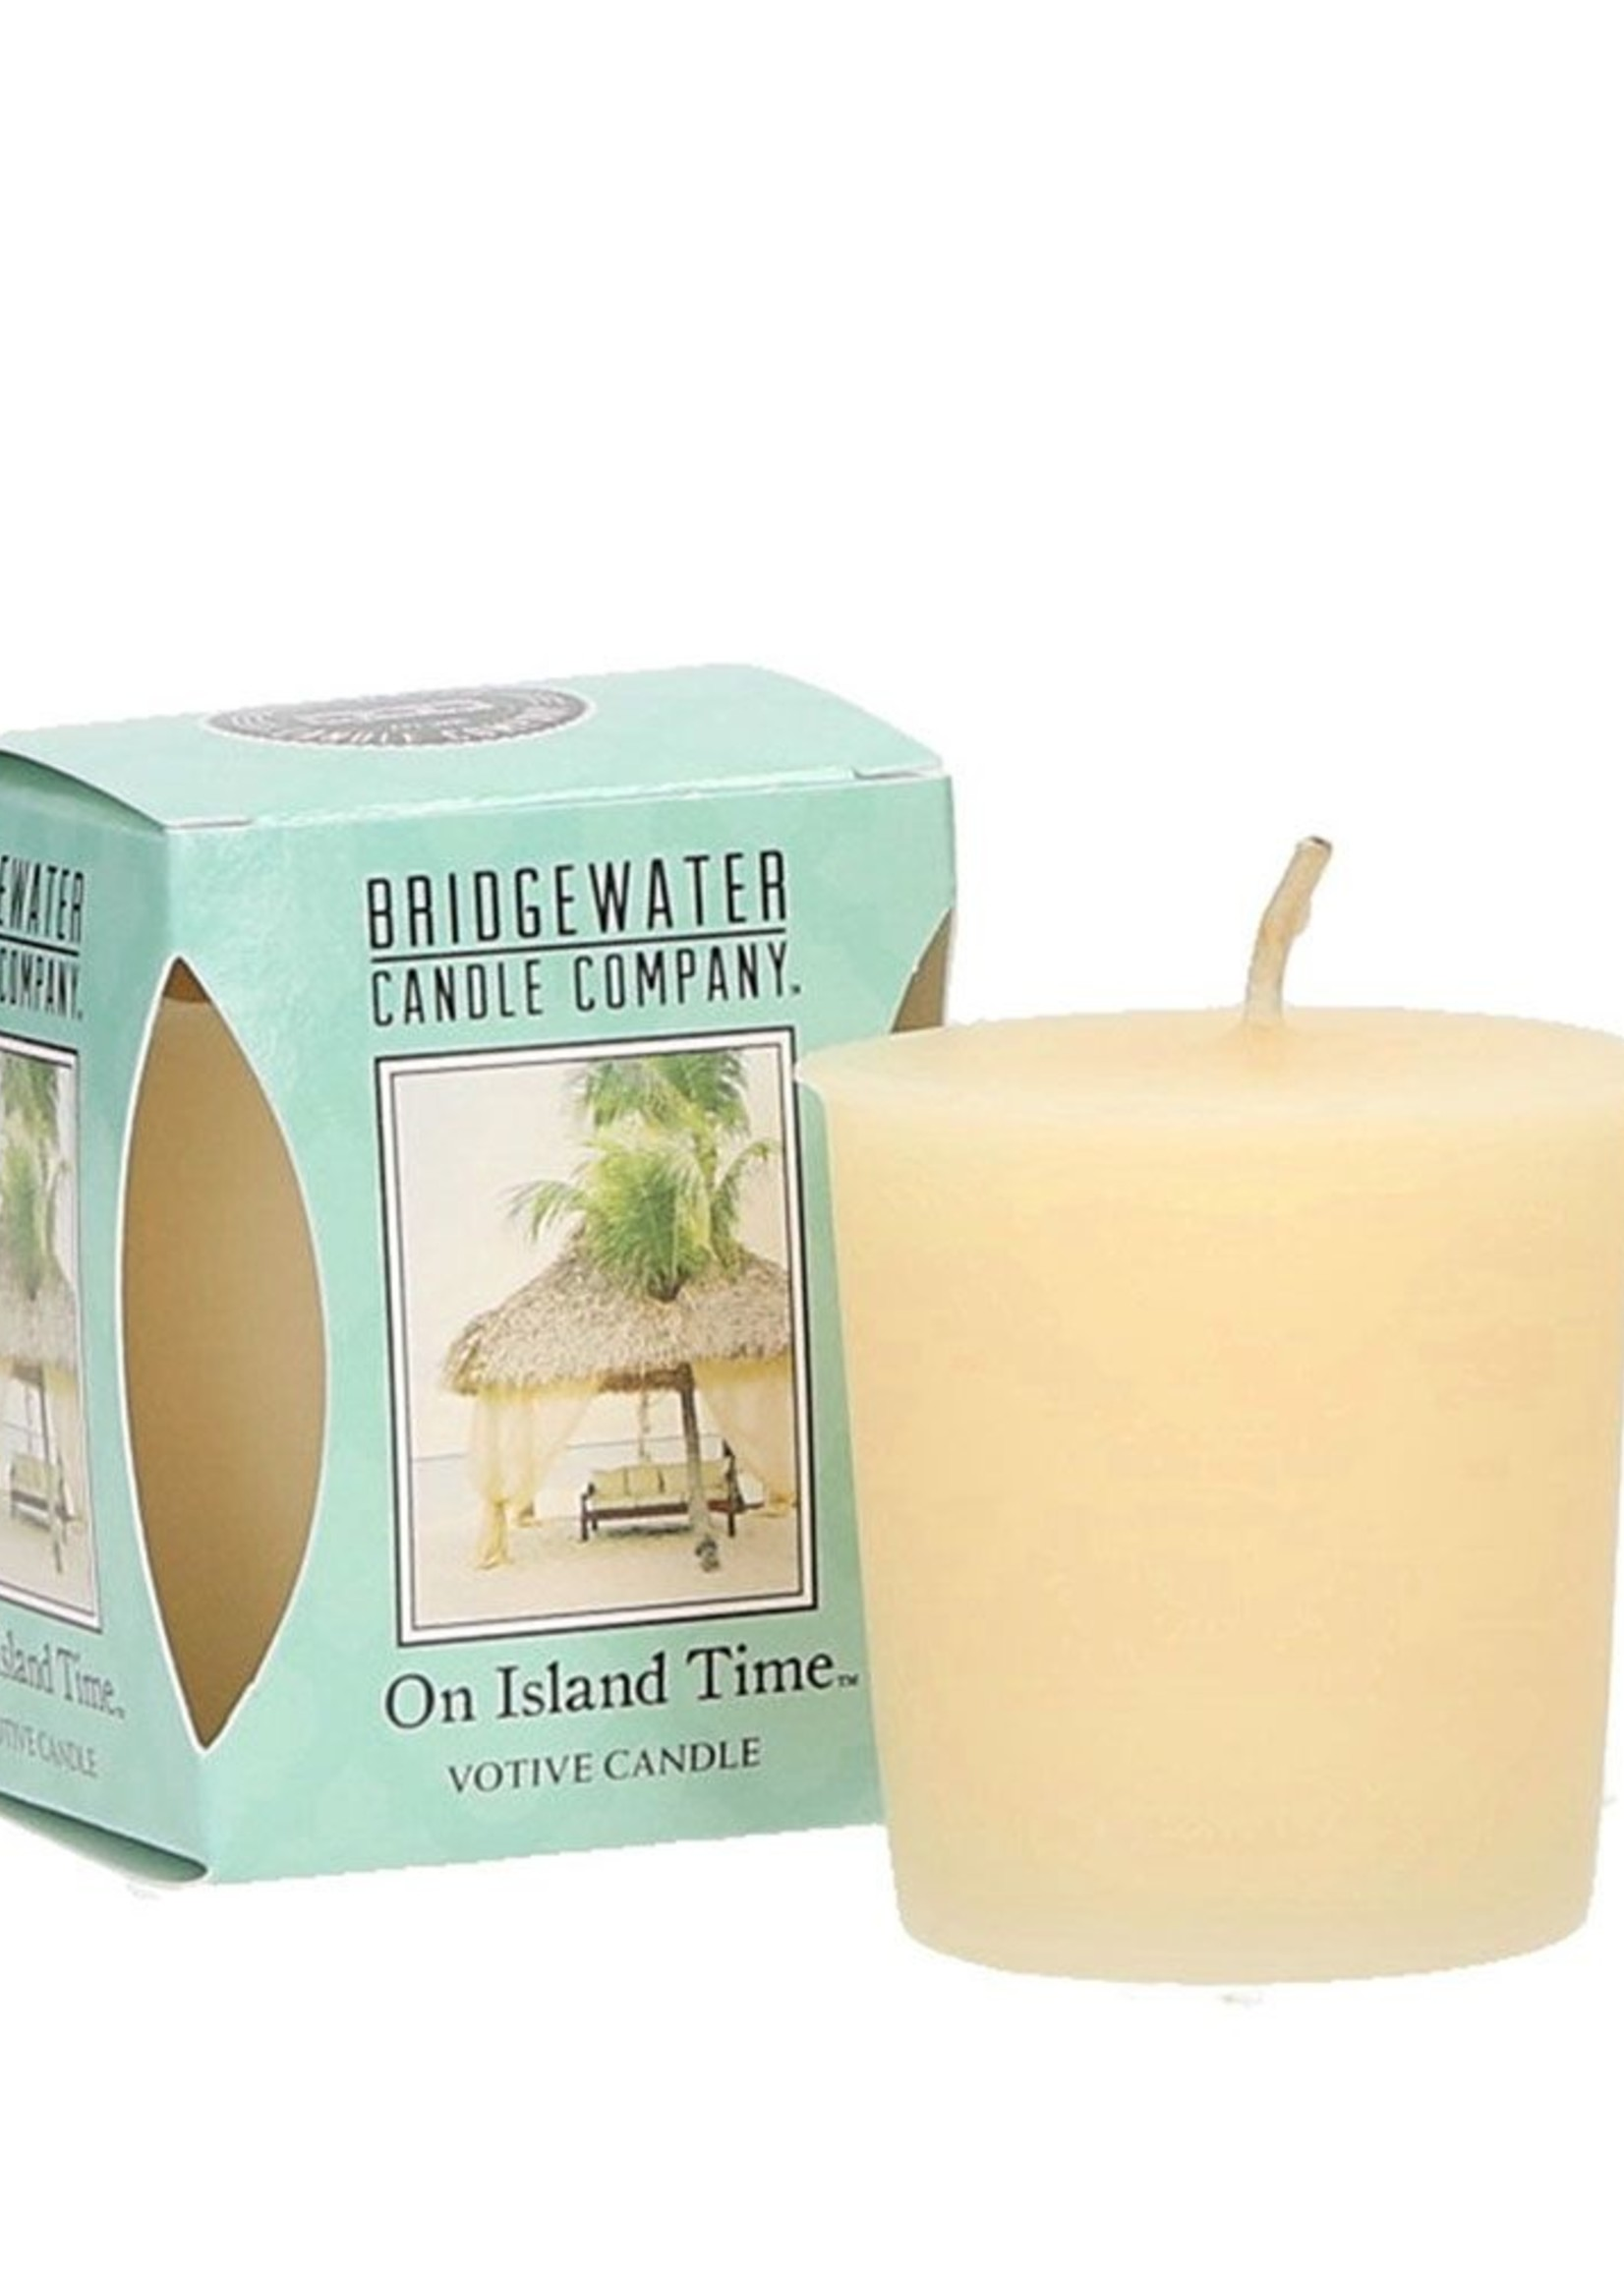 Bridgewater Votive Candle on Island Time